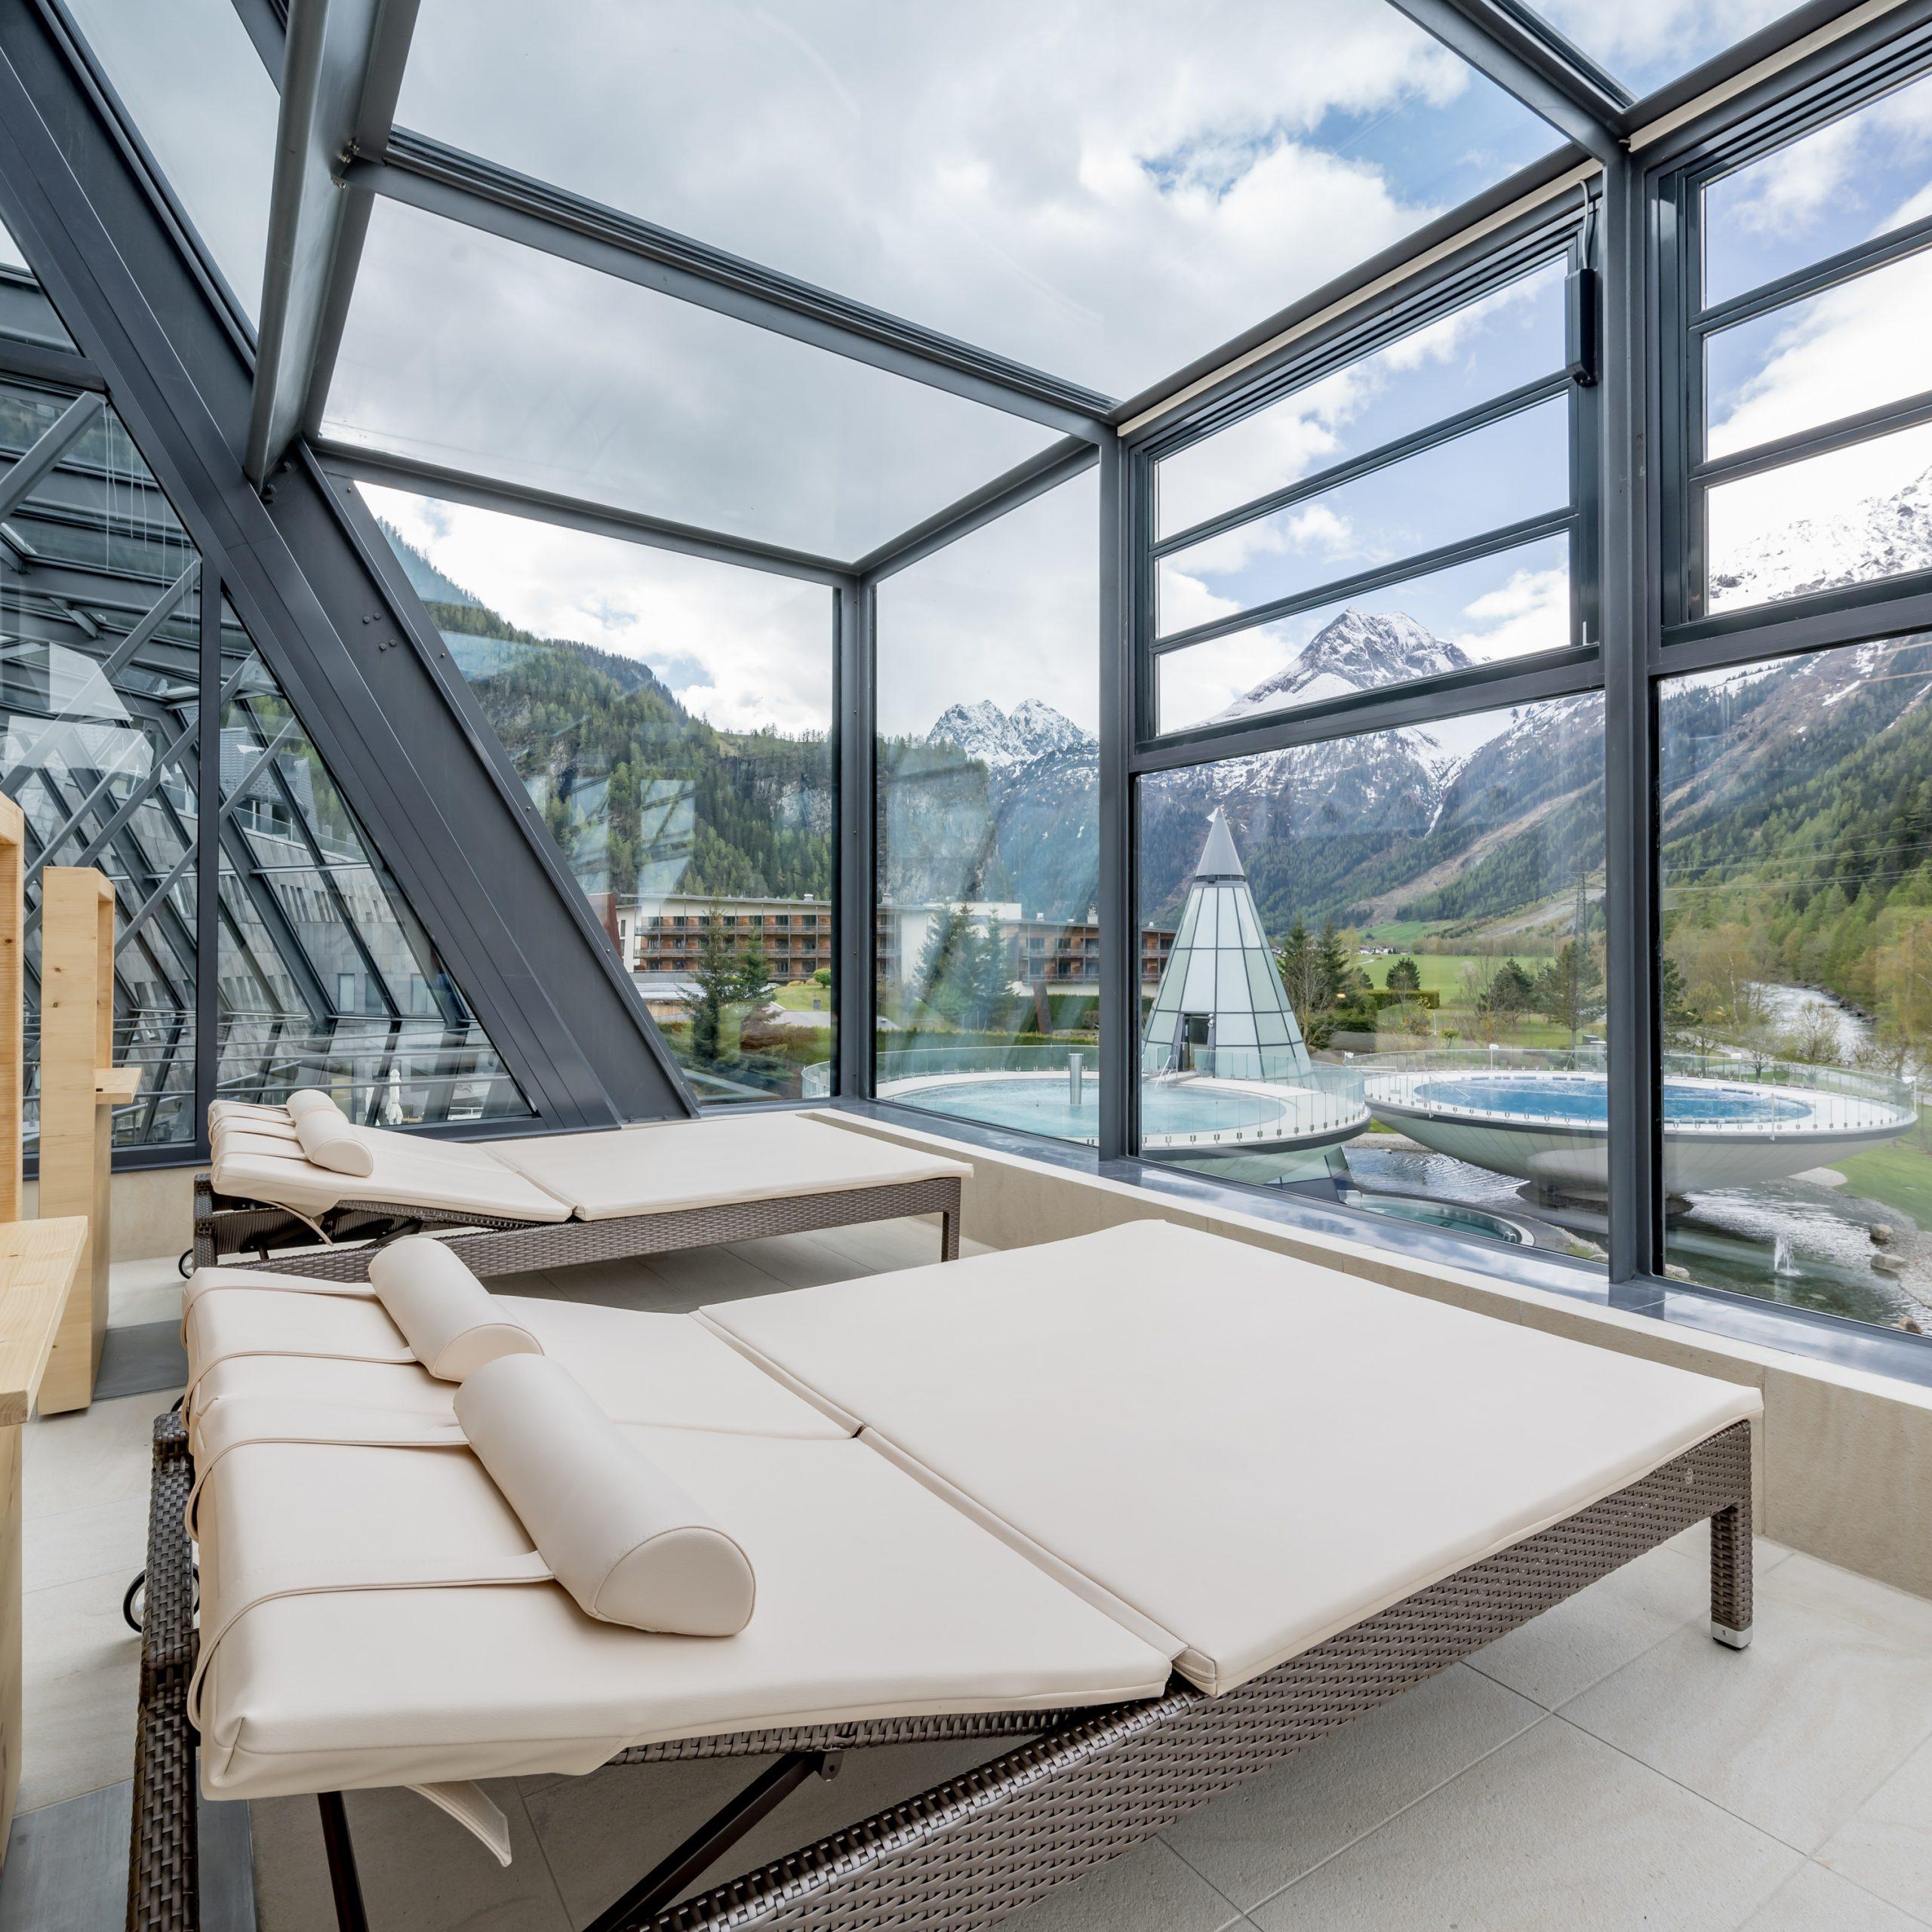 Aqua Dome Längenfeld / Rakouská jezera